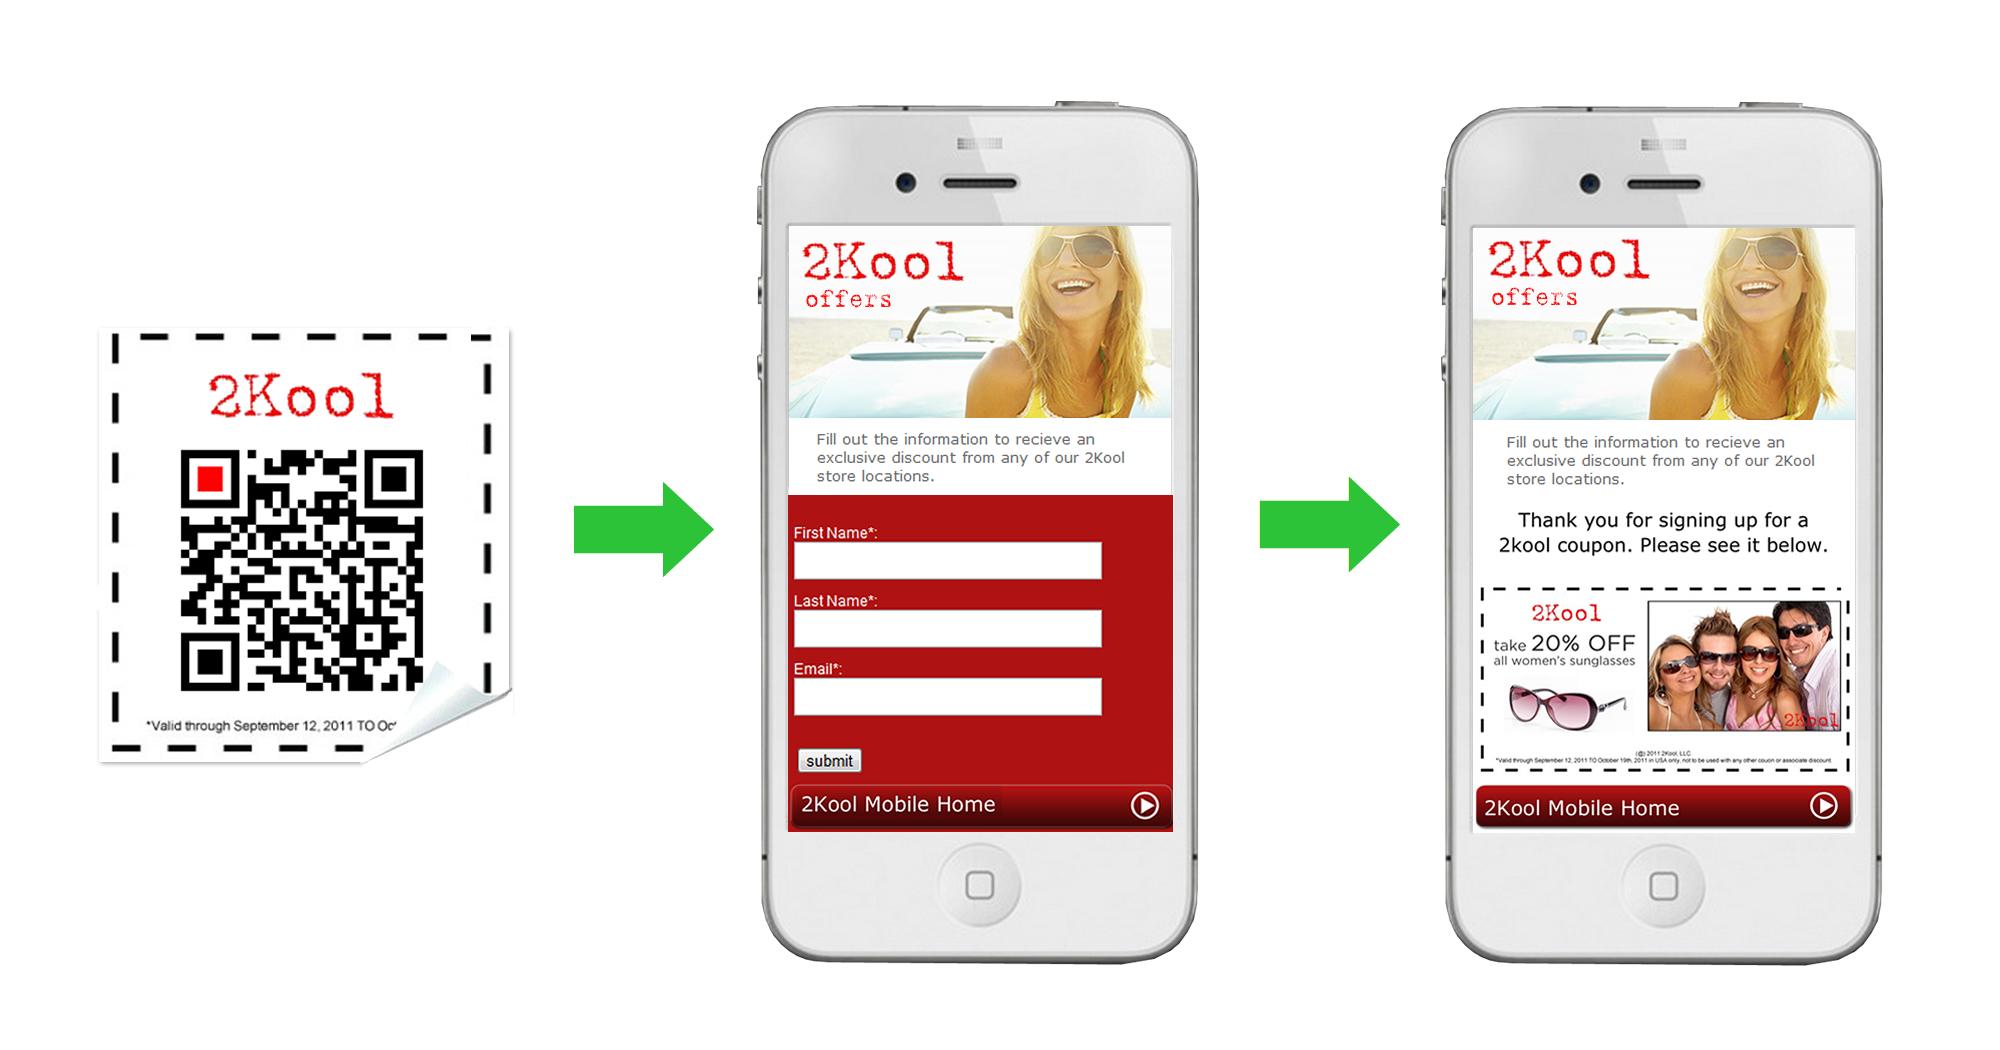 mobile_coupons_qr_code.jpg